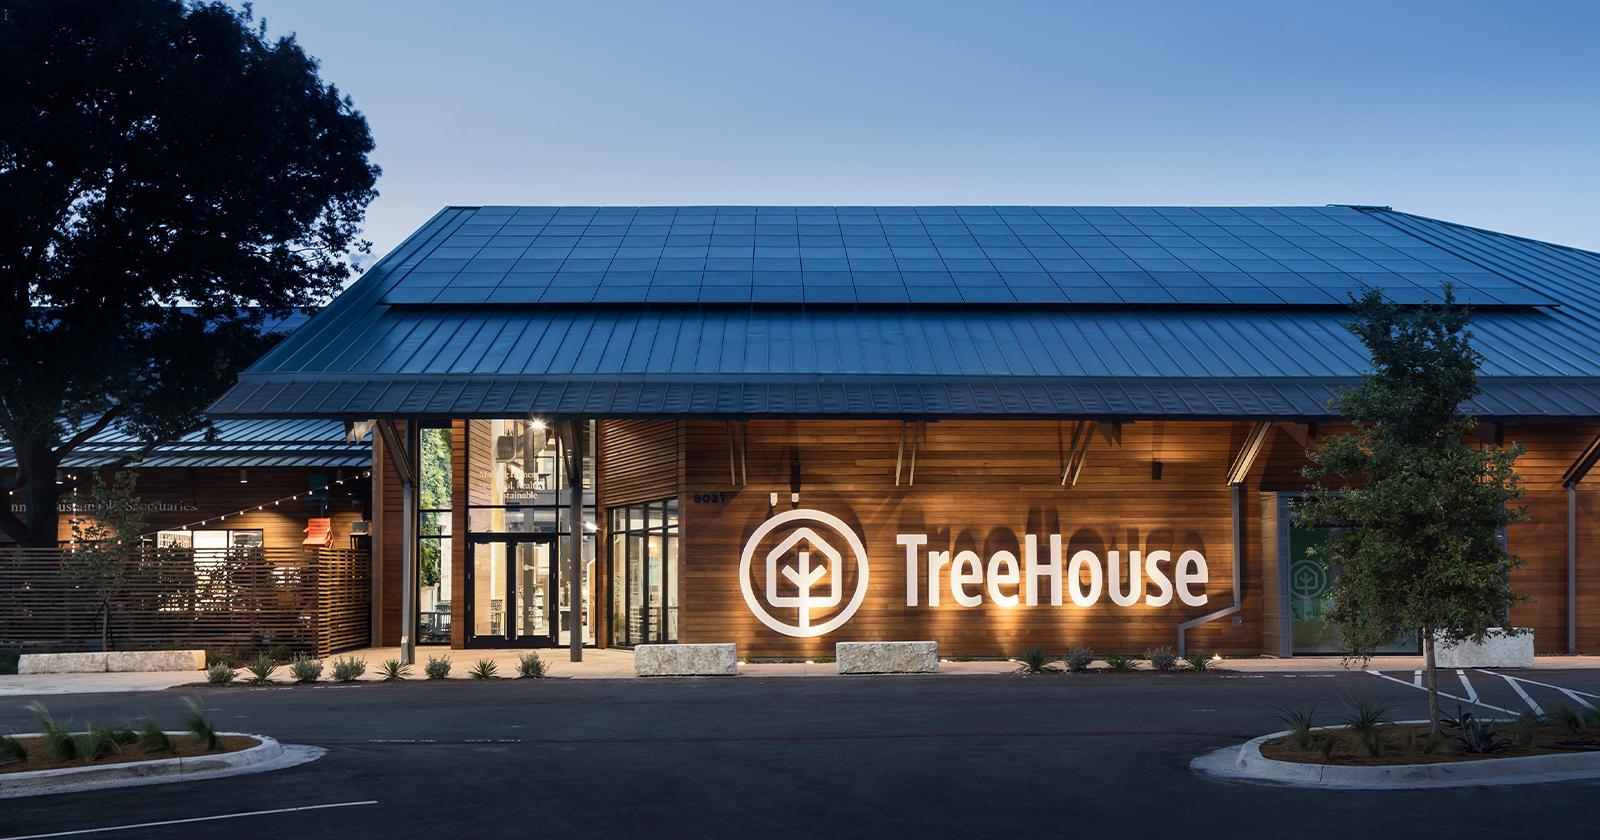 TreeHouse, Dallas, TX